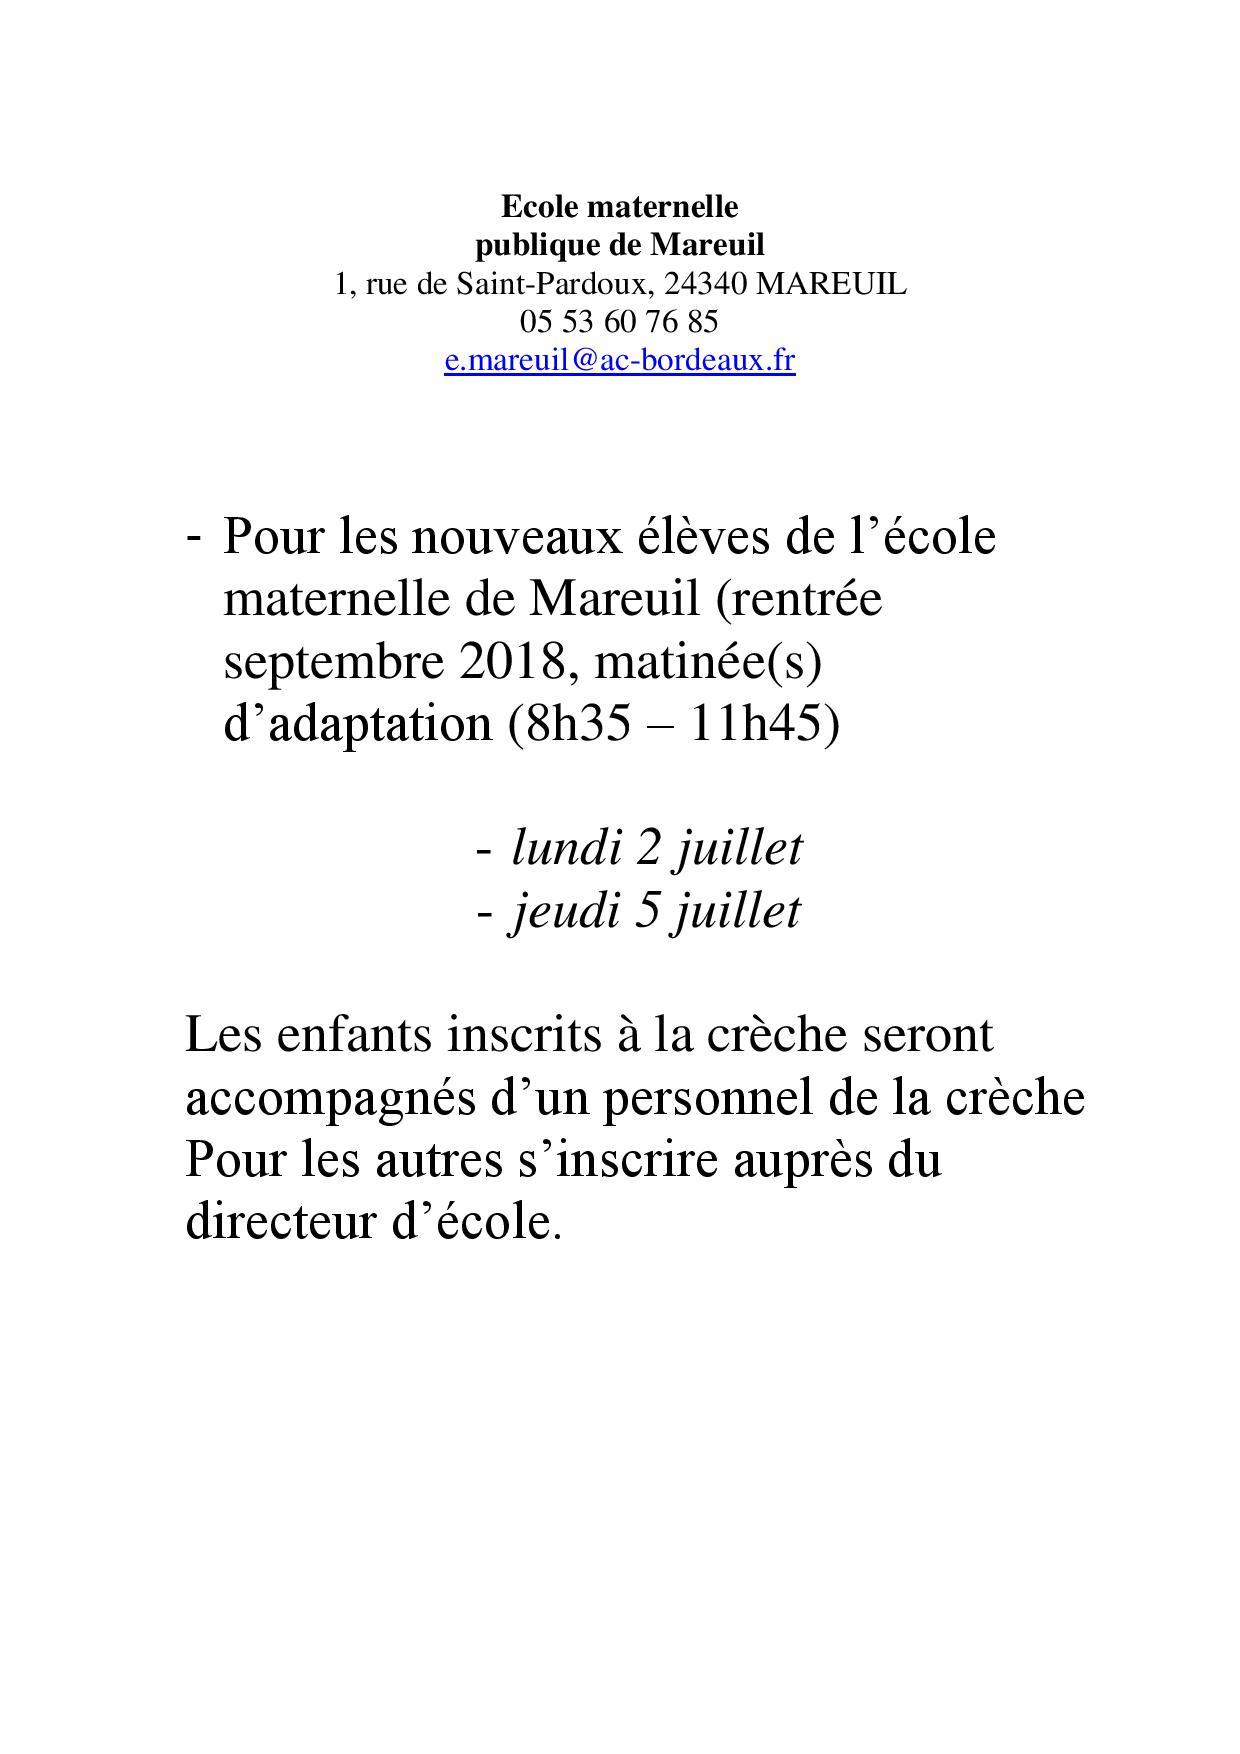 Inscription Ecole Maternelle Mareuil